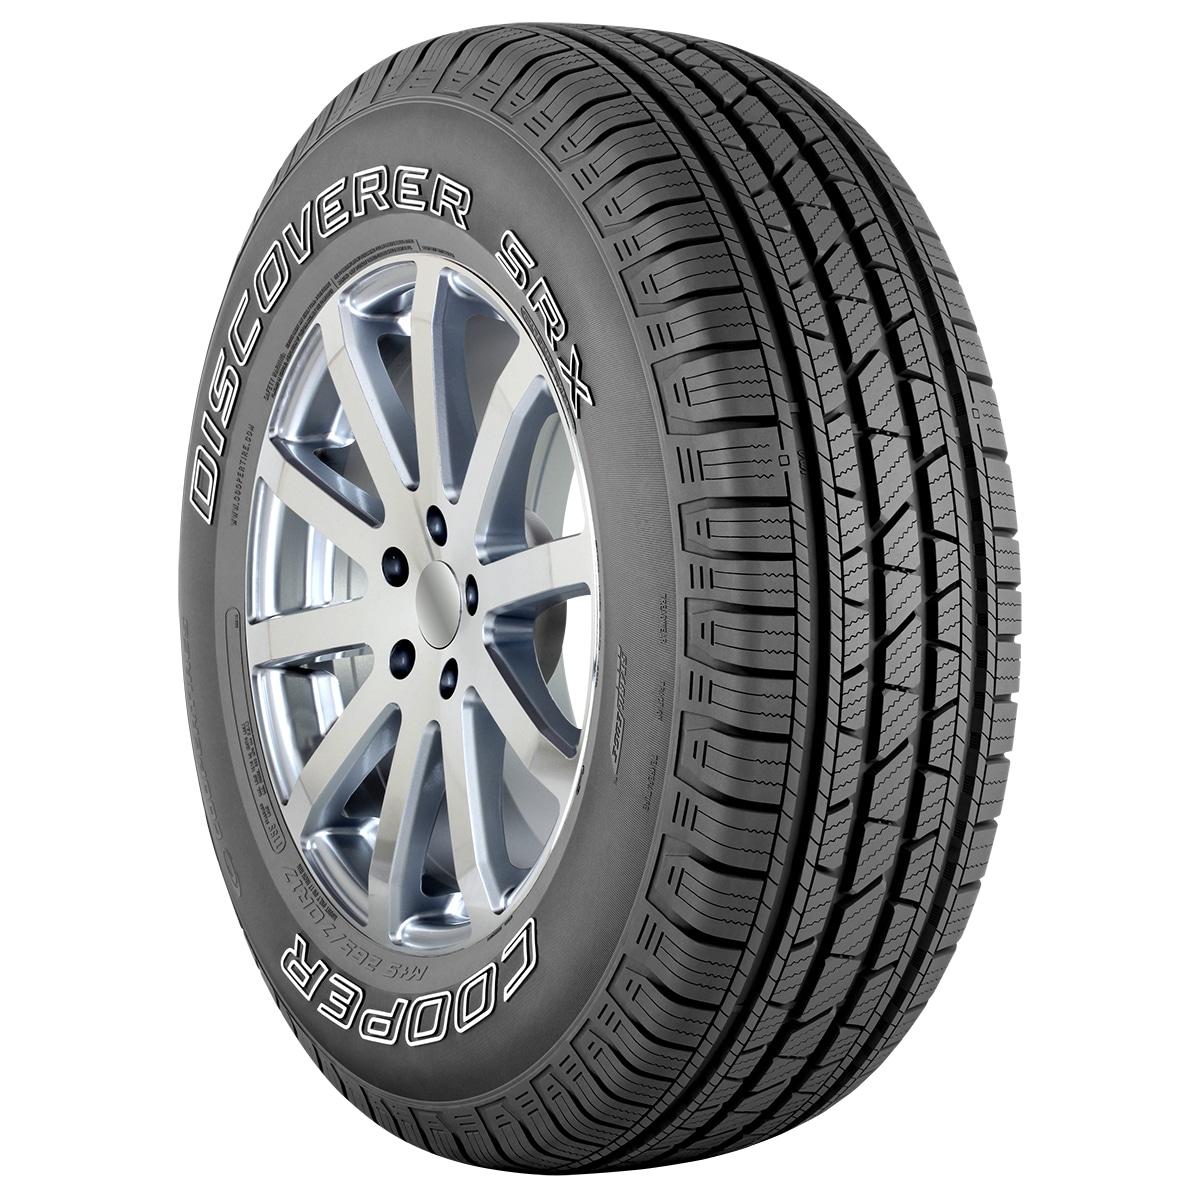 COOPER Discoverer SRX All Season Tire - 265/75R16 116T (B...